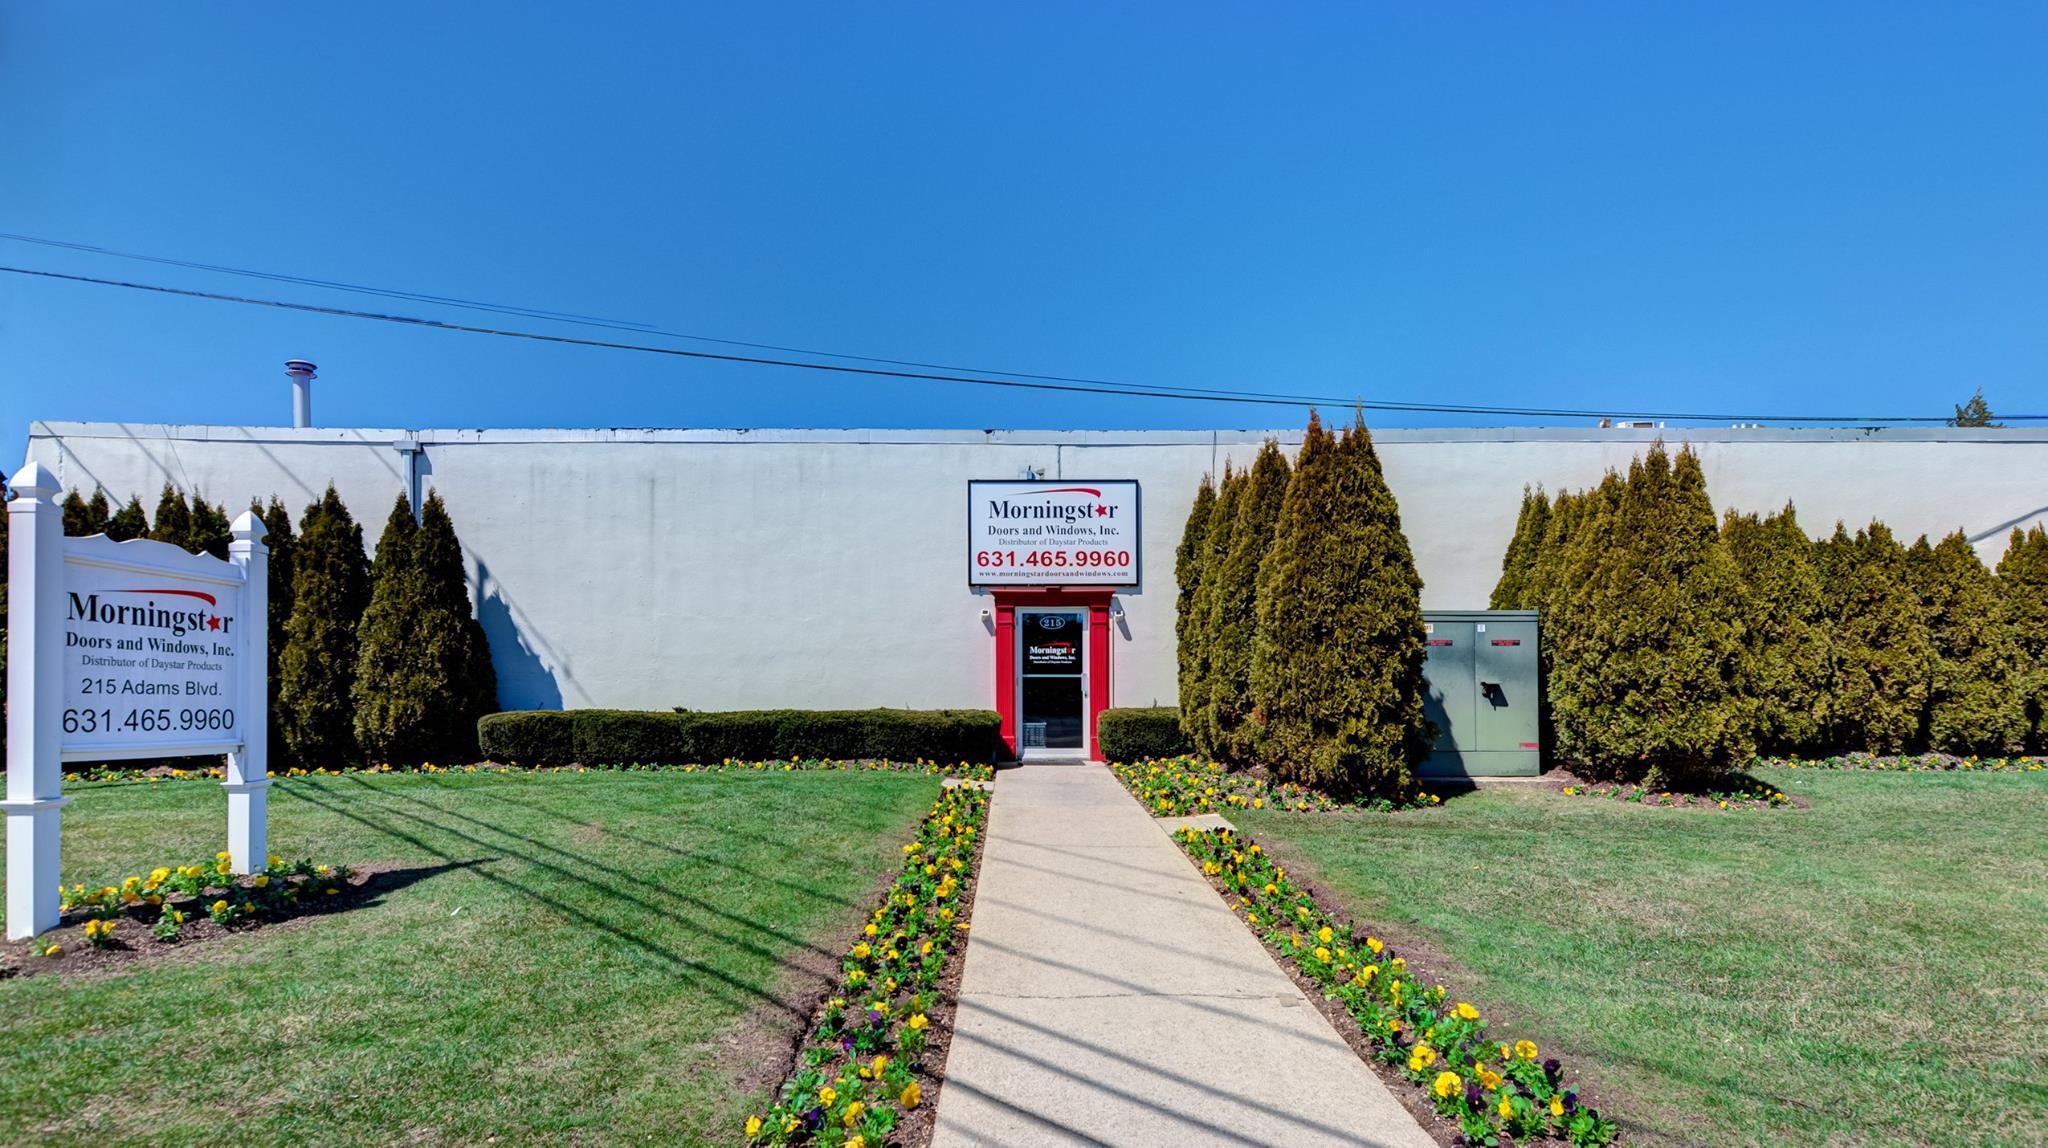 Morningstar Doors and Windows, Inc. reviews | Building Supplies at 215 Adams Blvd. - Farmingdale NY